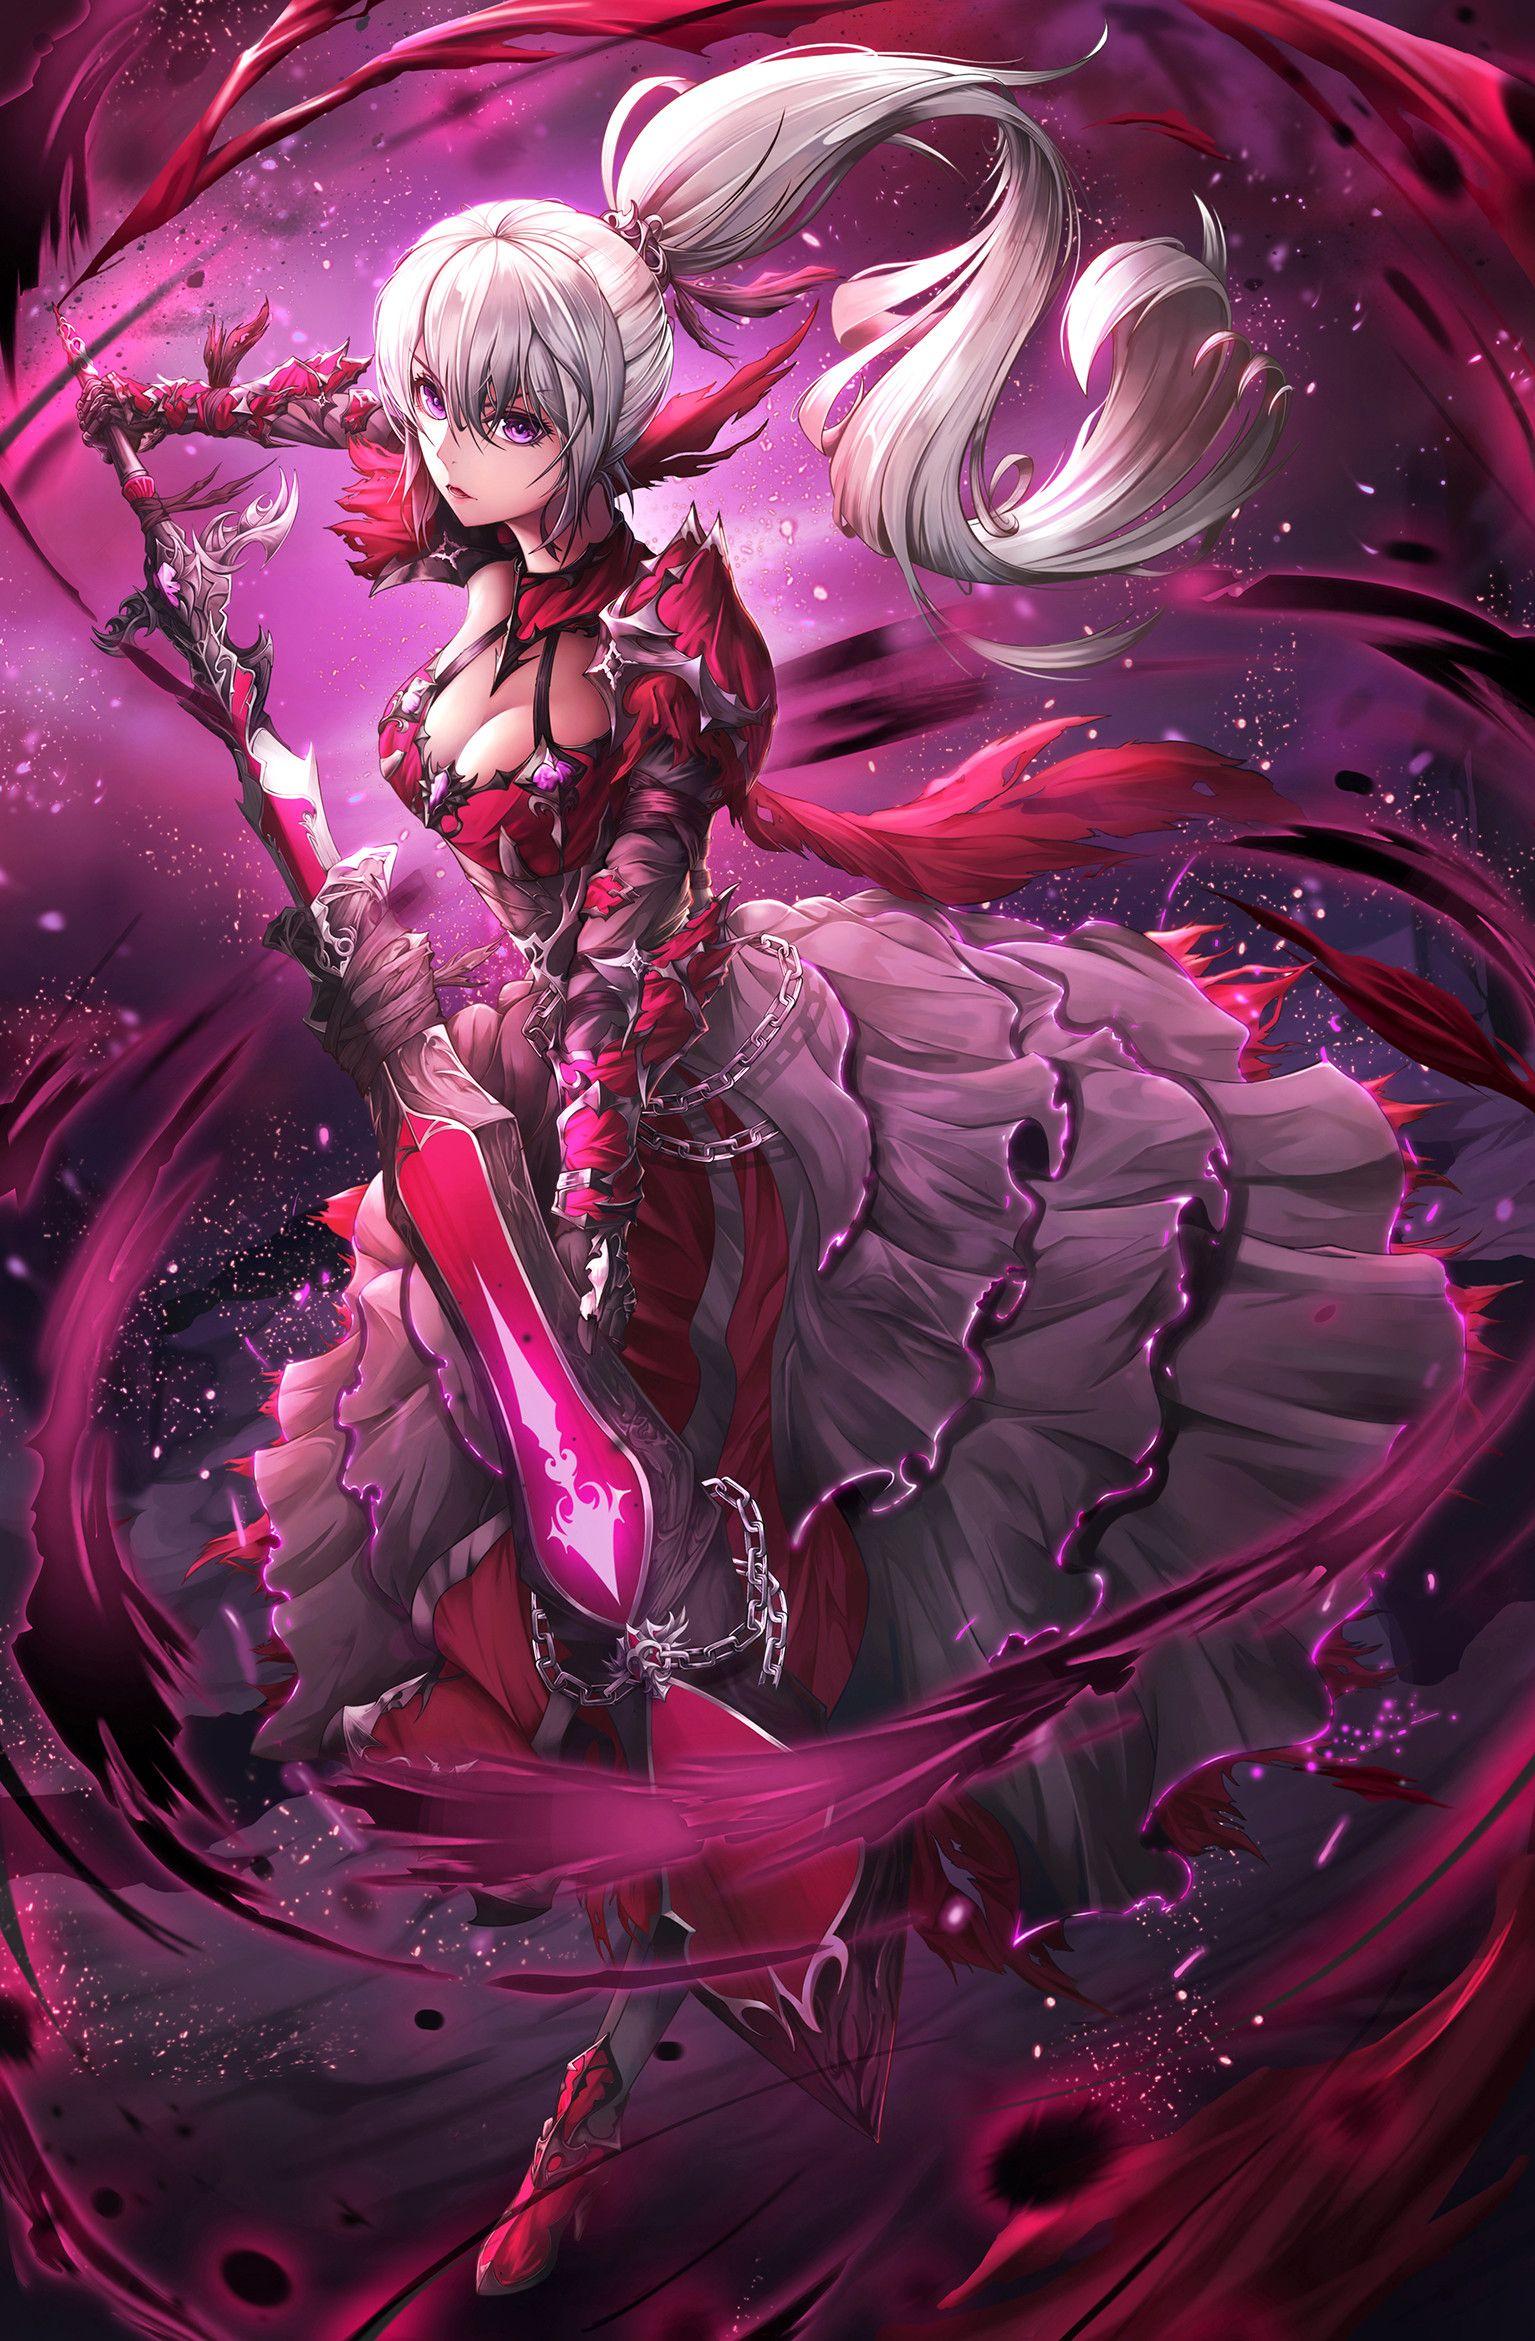 Artstation Dark Knight Ji Hyeong Kim Fantasy Art Warrior Anime Warrior Cool Anime Pictures